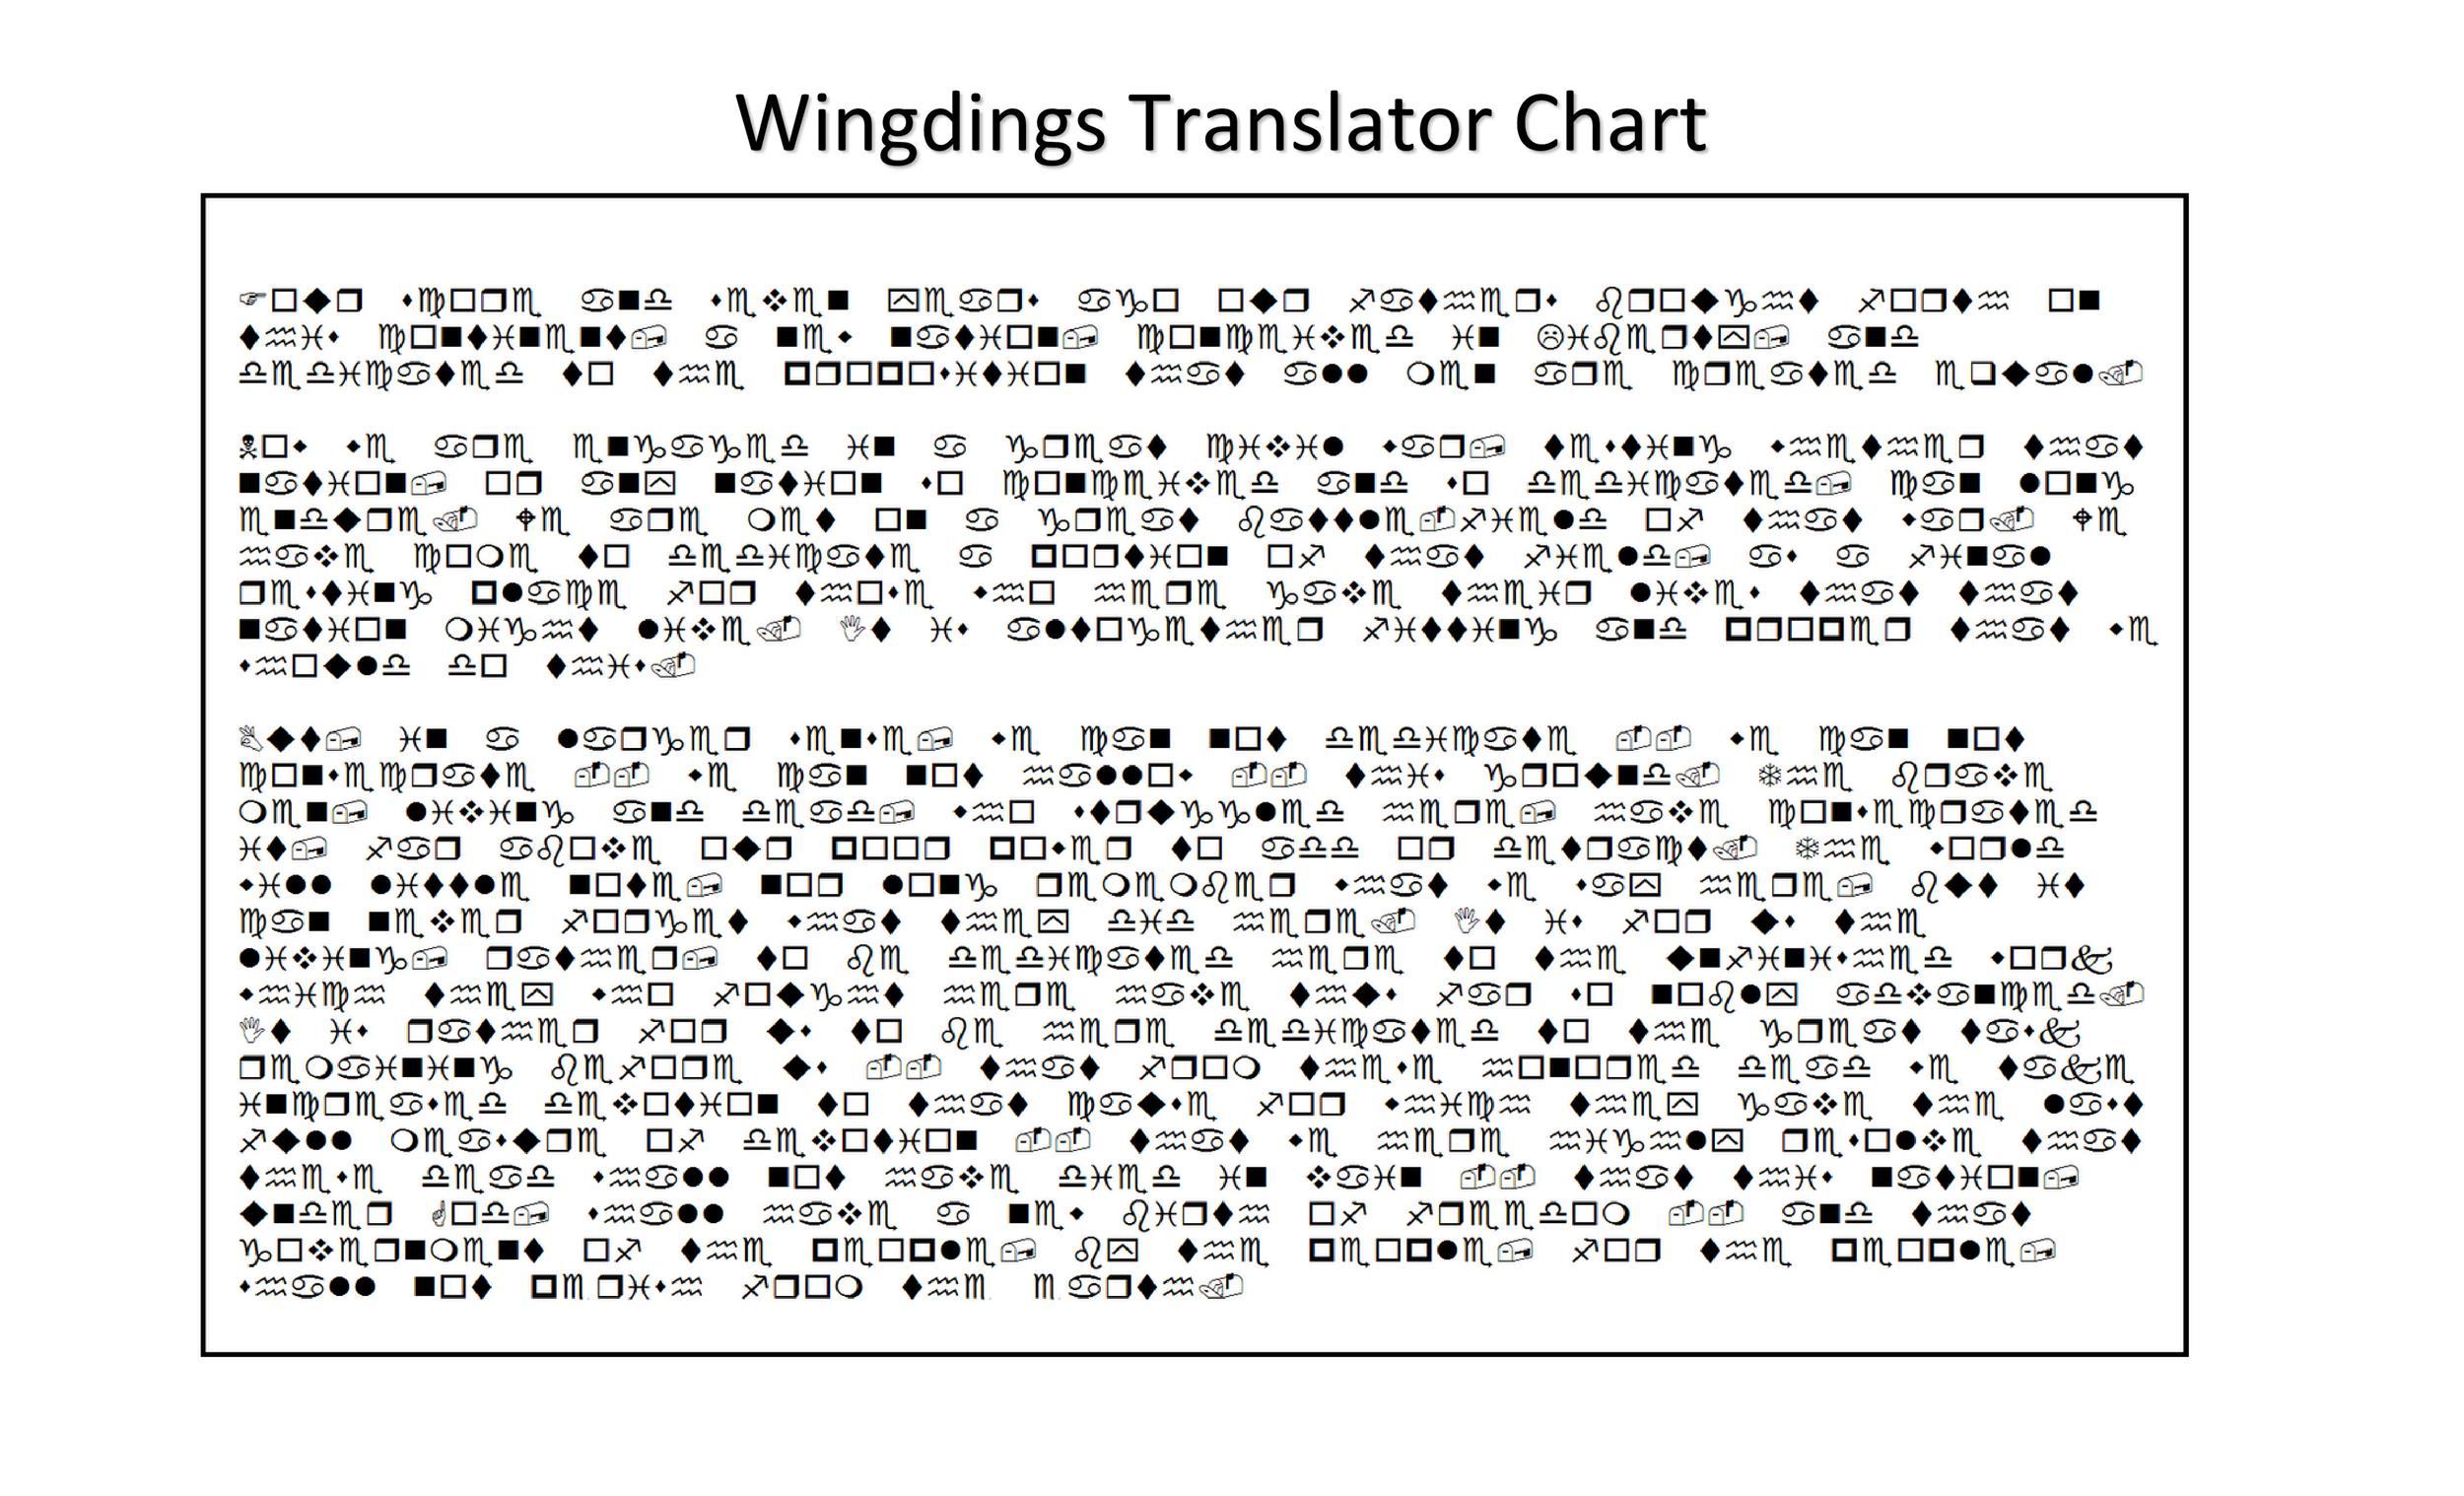 45 free wingdings translator